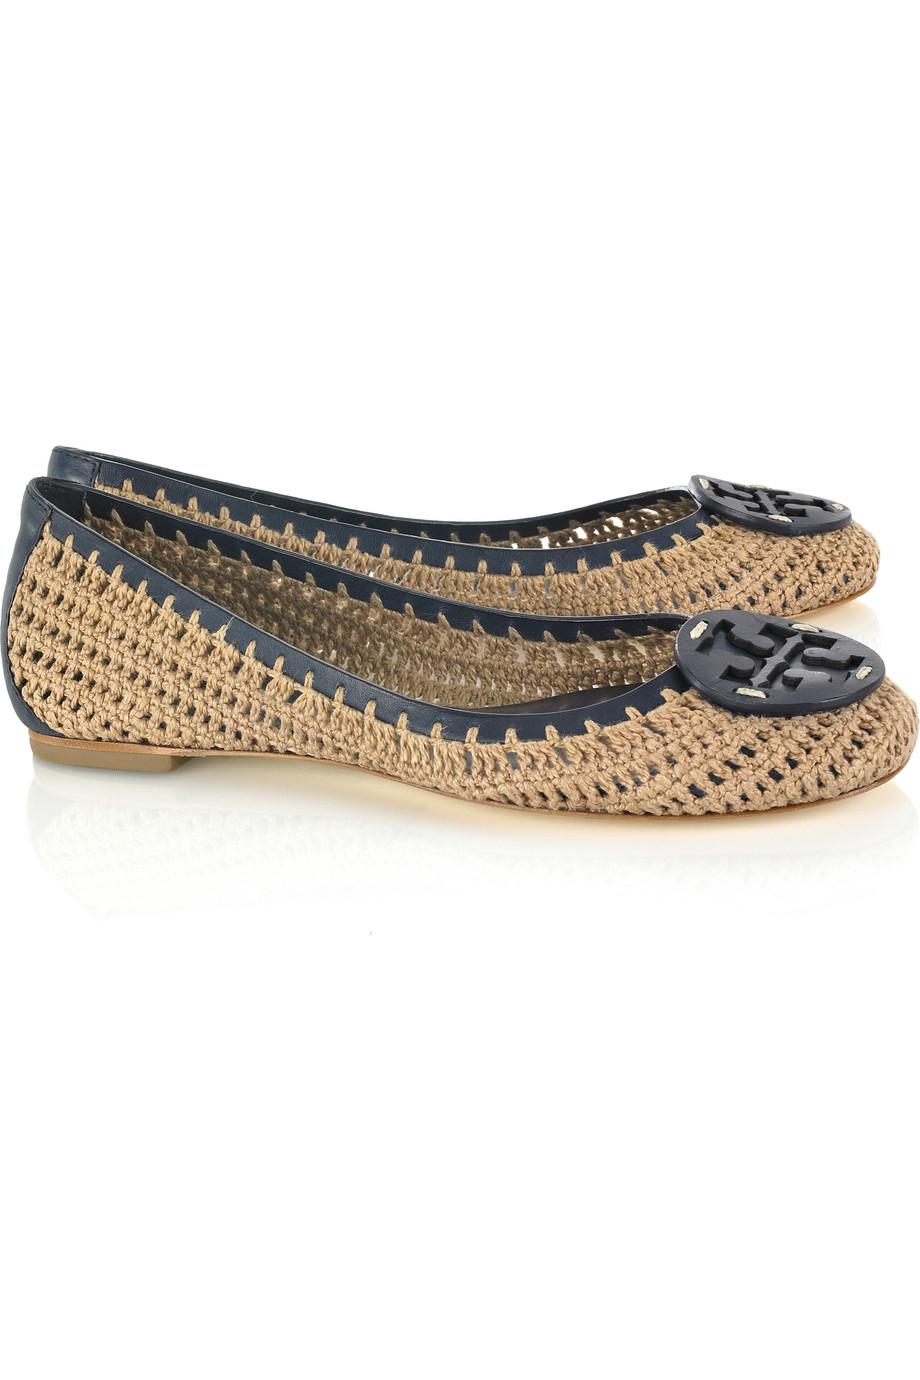 buy cheap 2014 2014 cheap price Tory Burch Crochet Round-Toe Flats eCxcrI0FMS